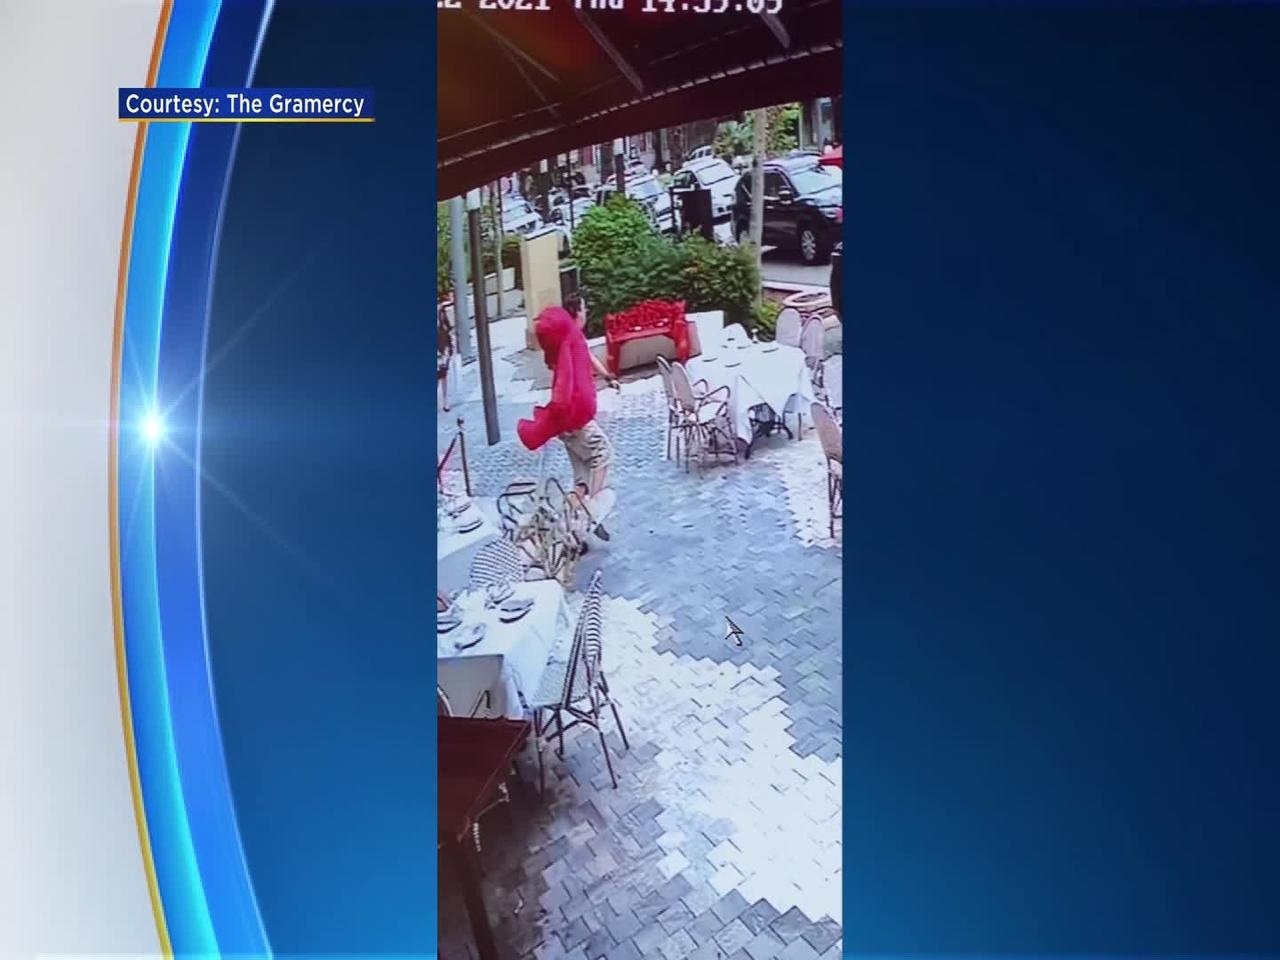 Surveillance Video Captures Man Stealing Pricey Jumbo Teddy Bear Outside Gables Restaurant